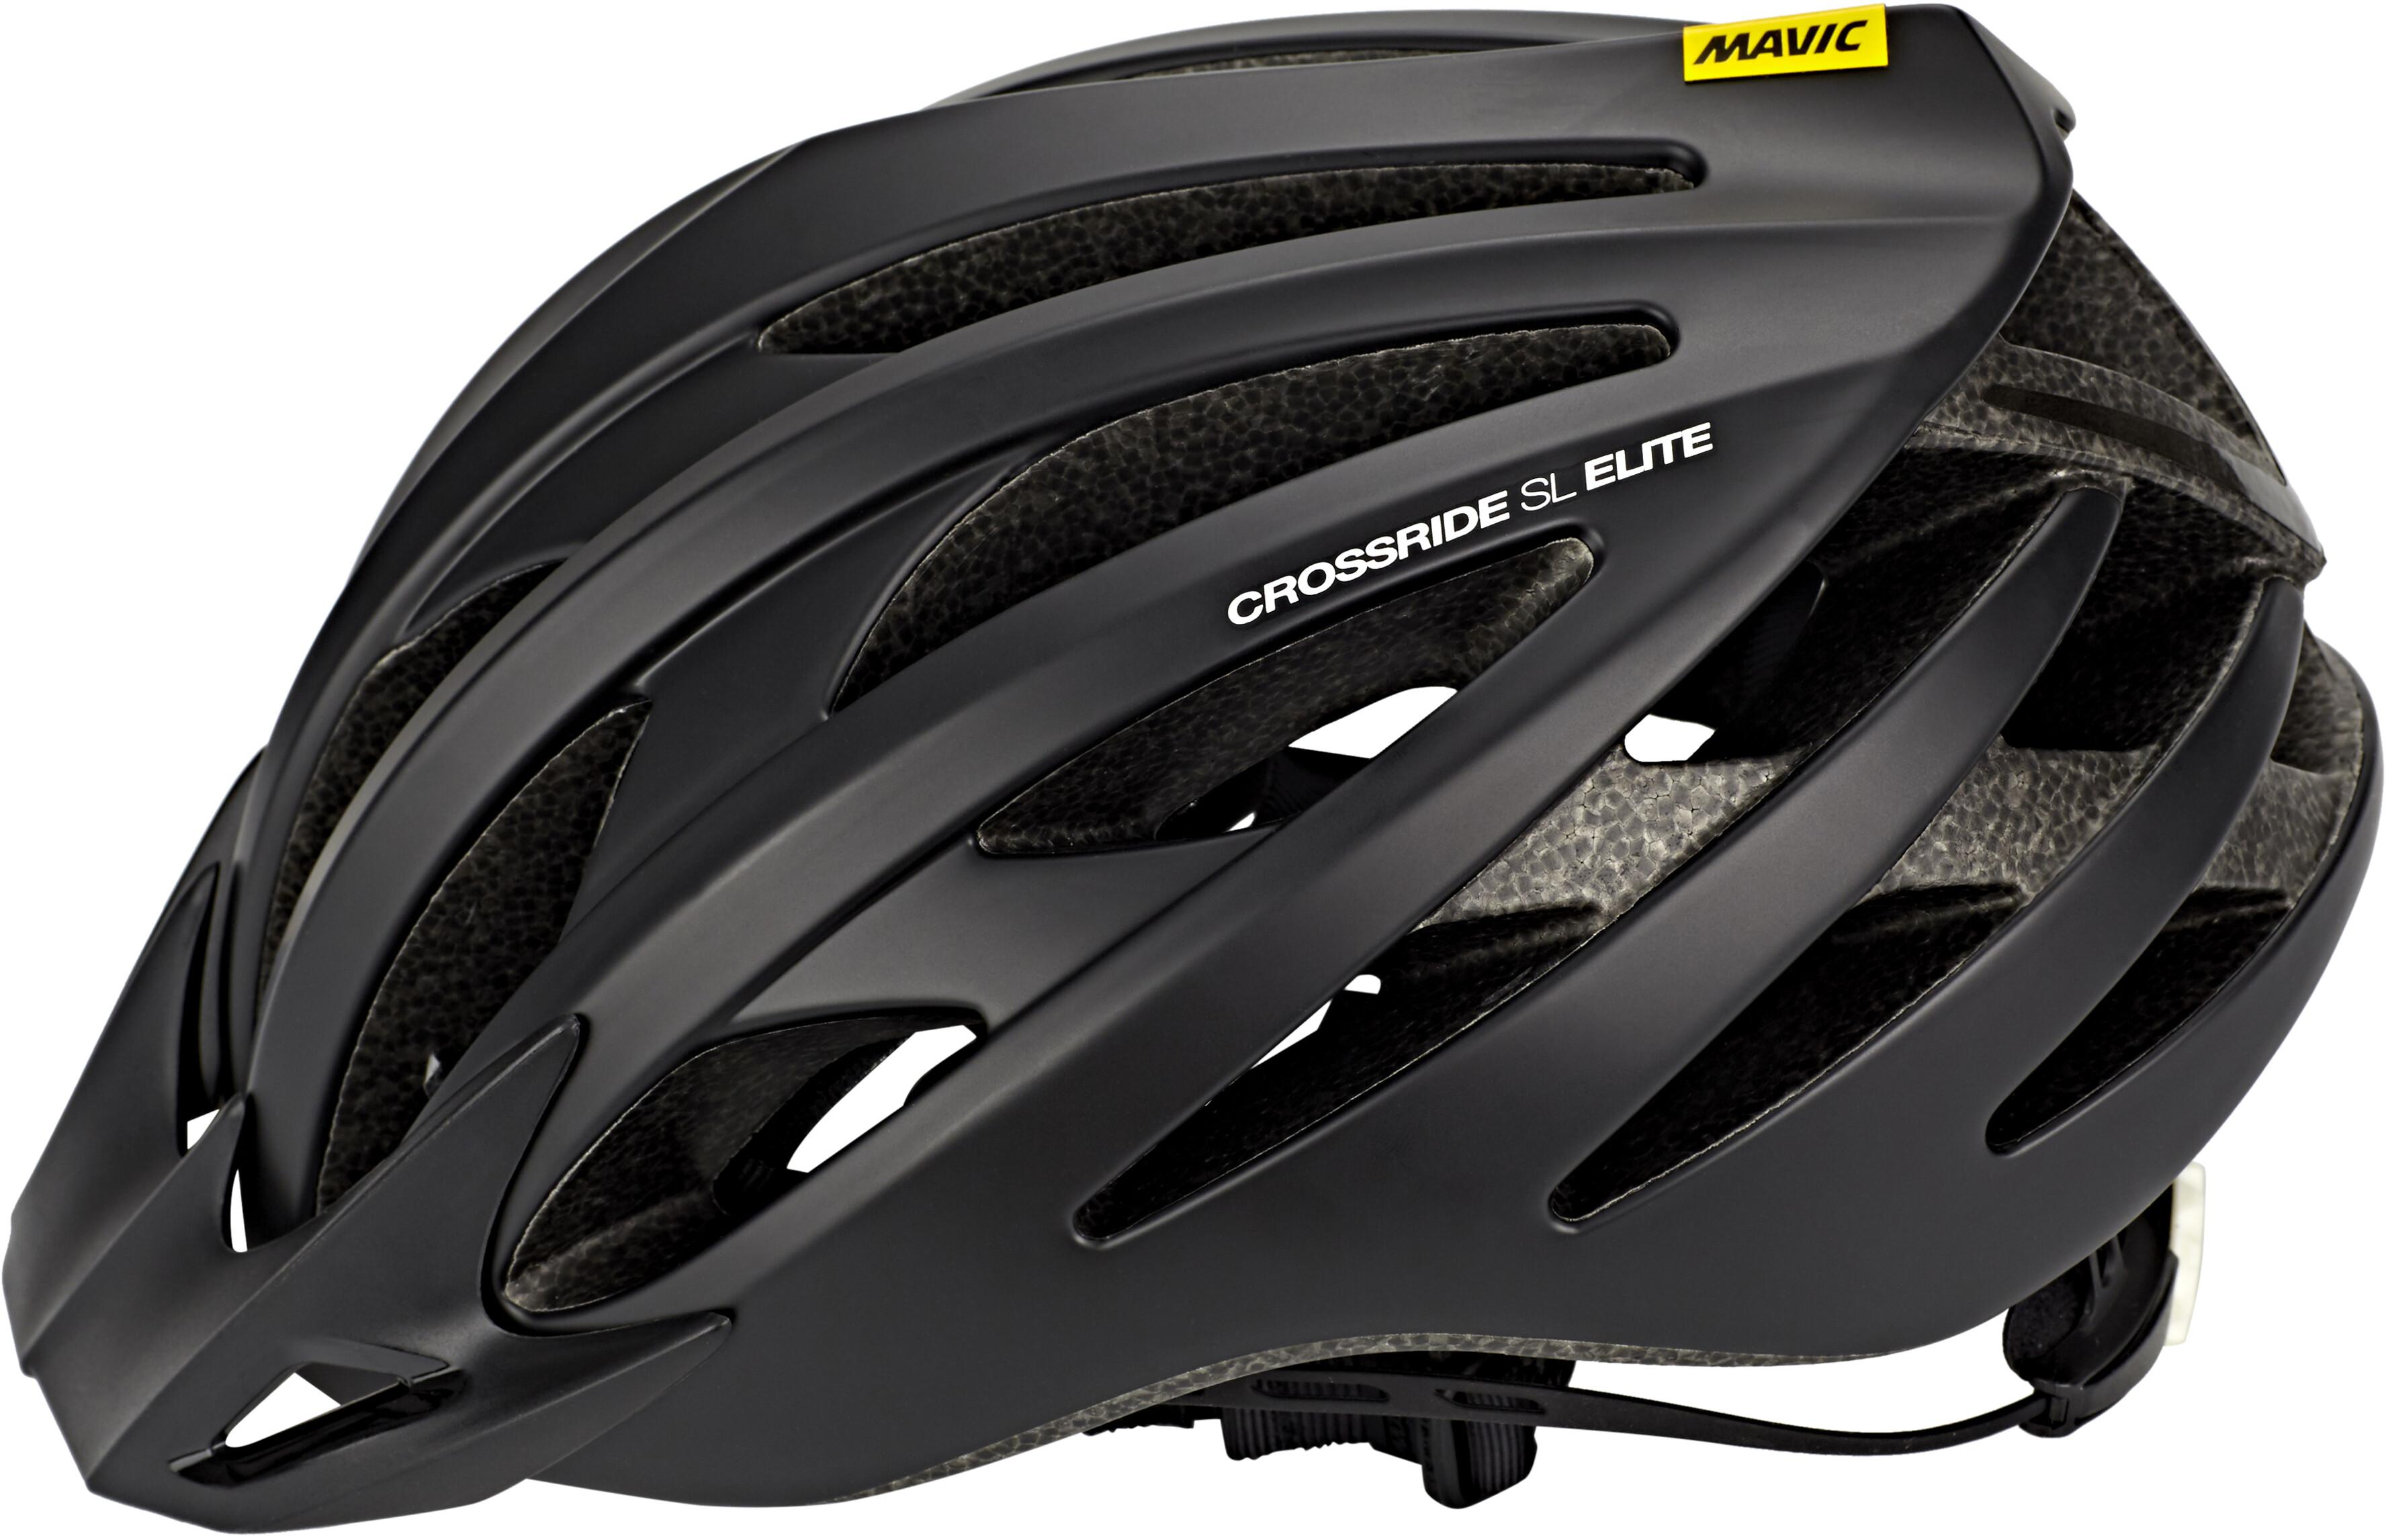 d1cee07fbf9 ▷ Mavic Crossride SL Elite Helmet Men Black/White online bei ...